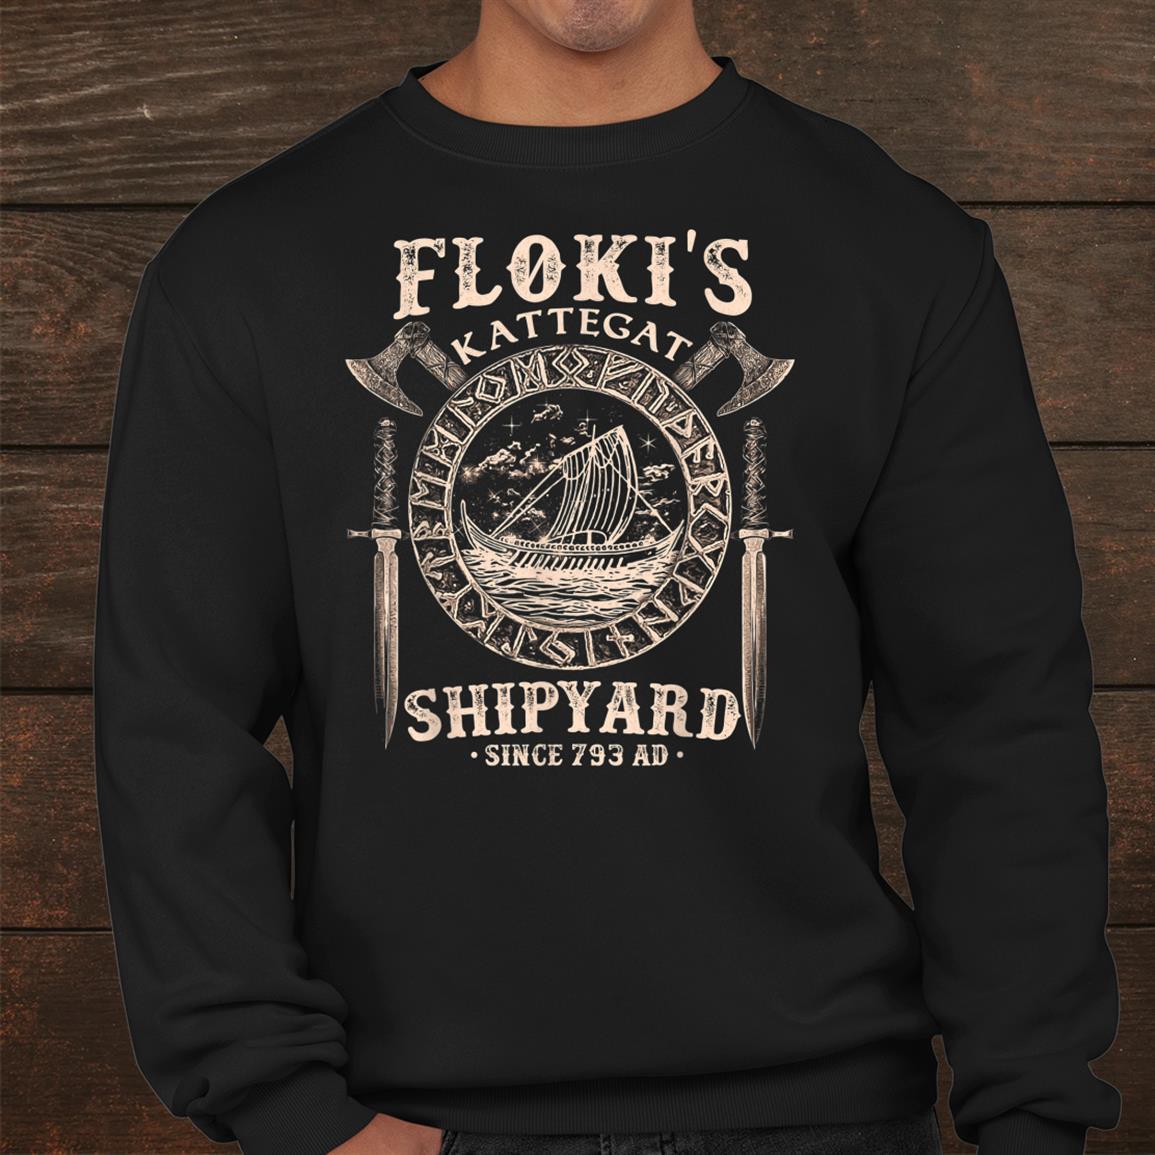 Flokis Shipyard Kattegat Viking Ship And Sword Shirt